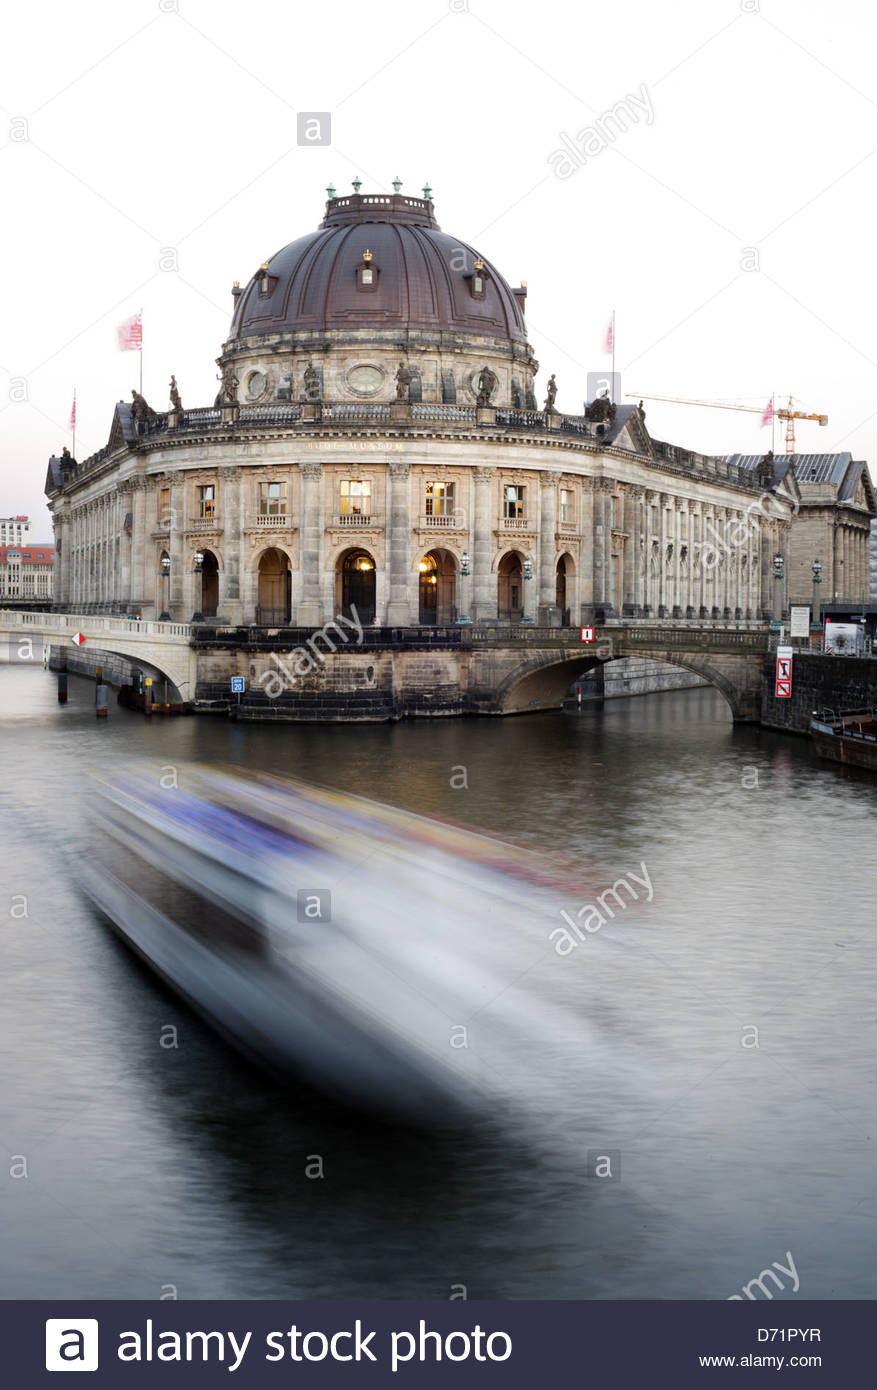 Museum at riverbank, Bode Museum, Museum Island, Berlin, Germany - Stock Image